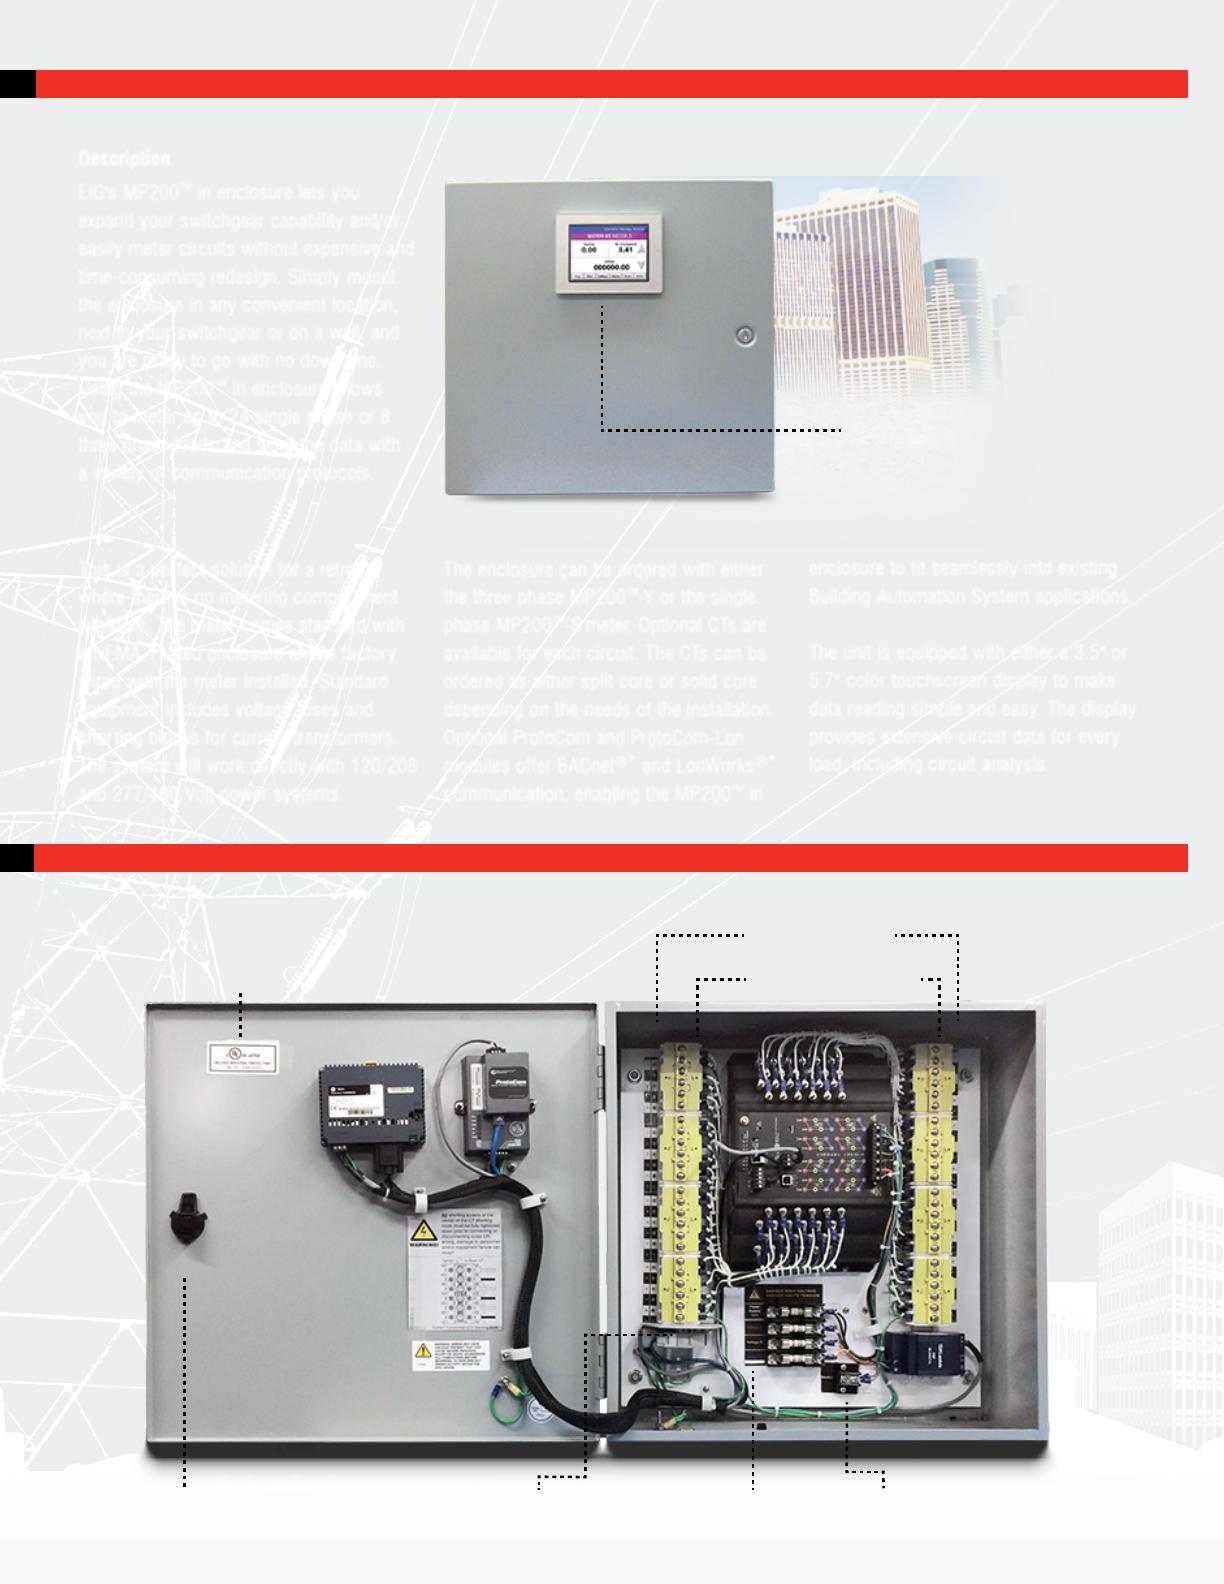 Mp200 Wiring Diagram